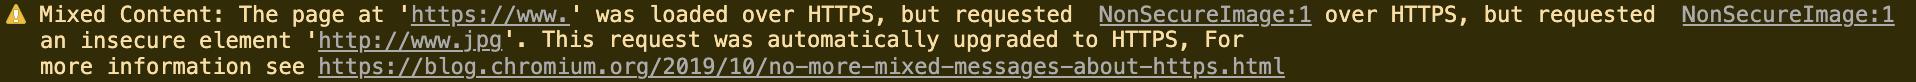 mixed-content-site-error-04.png